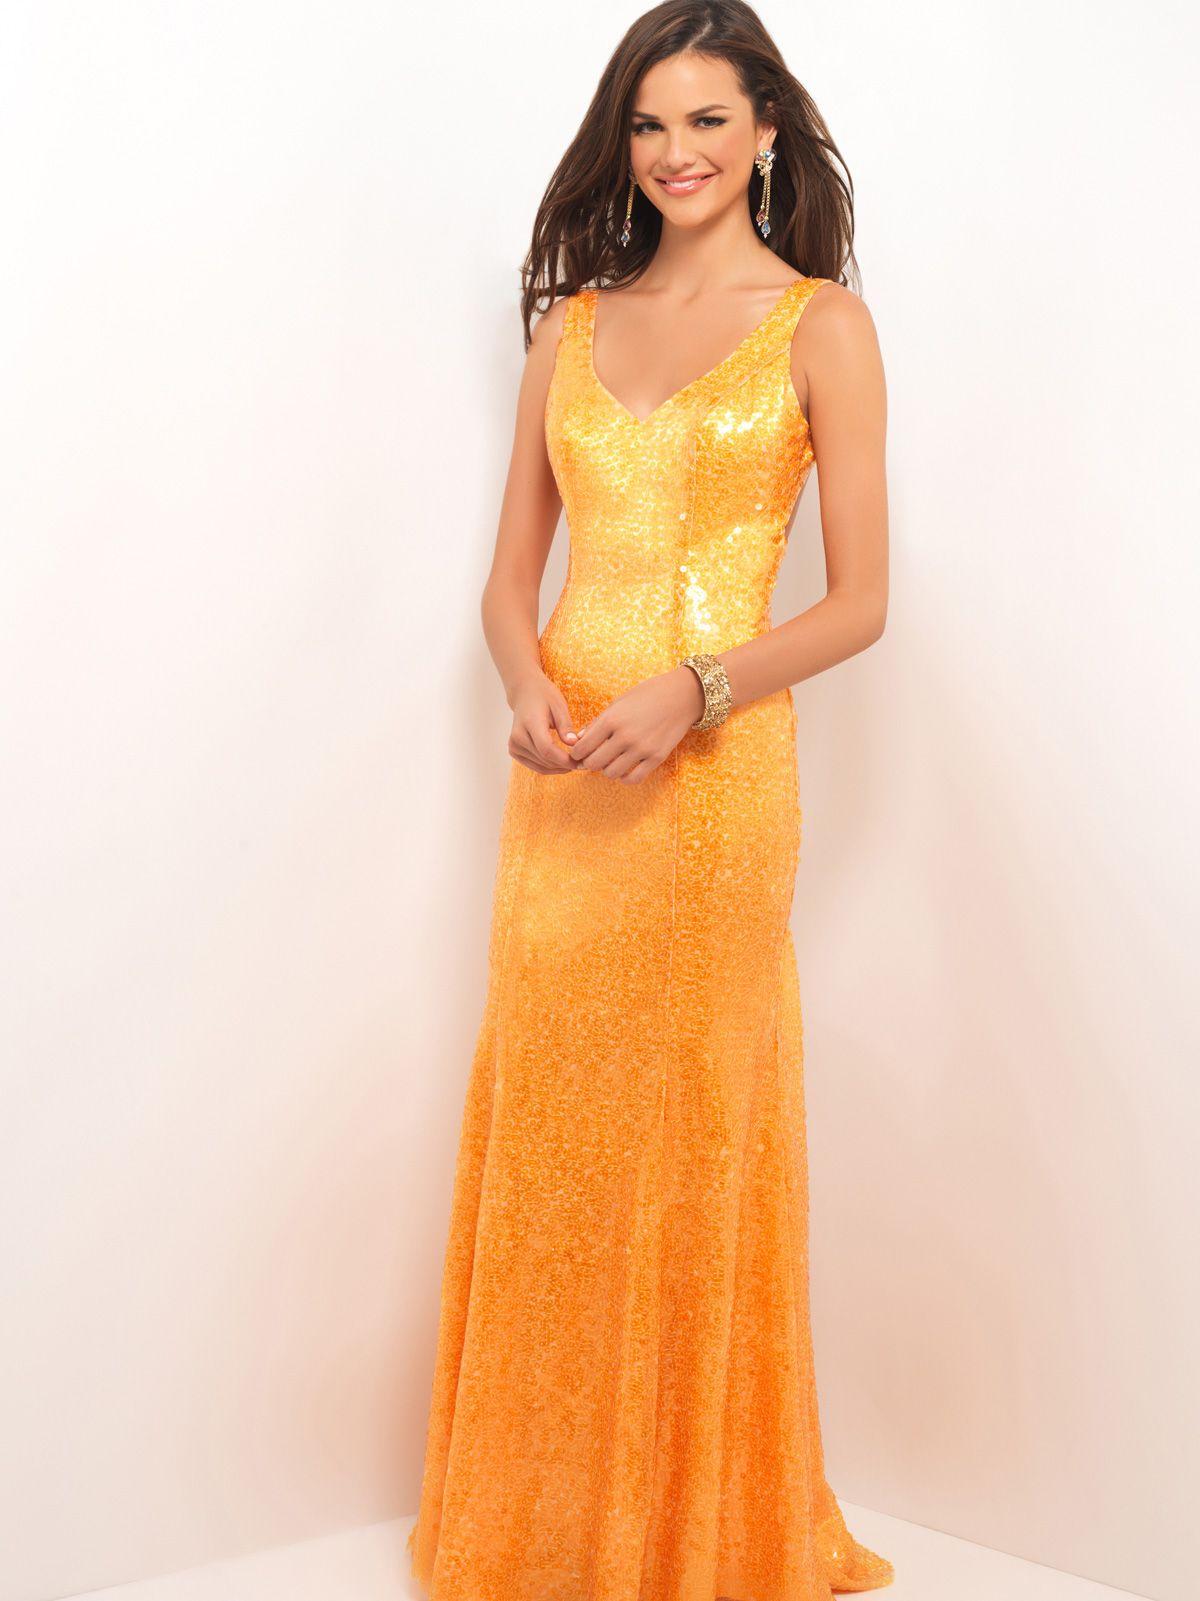 Mstylelab prom dresses